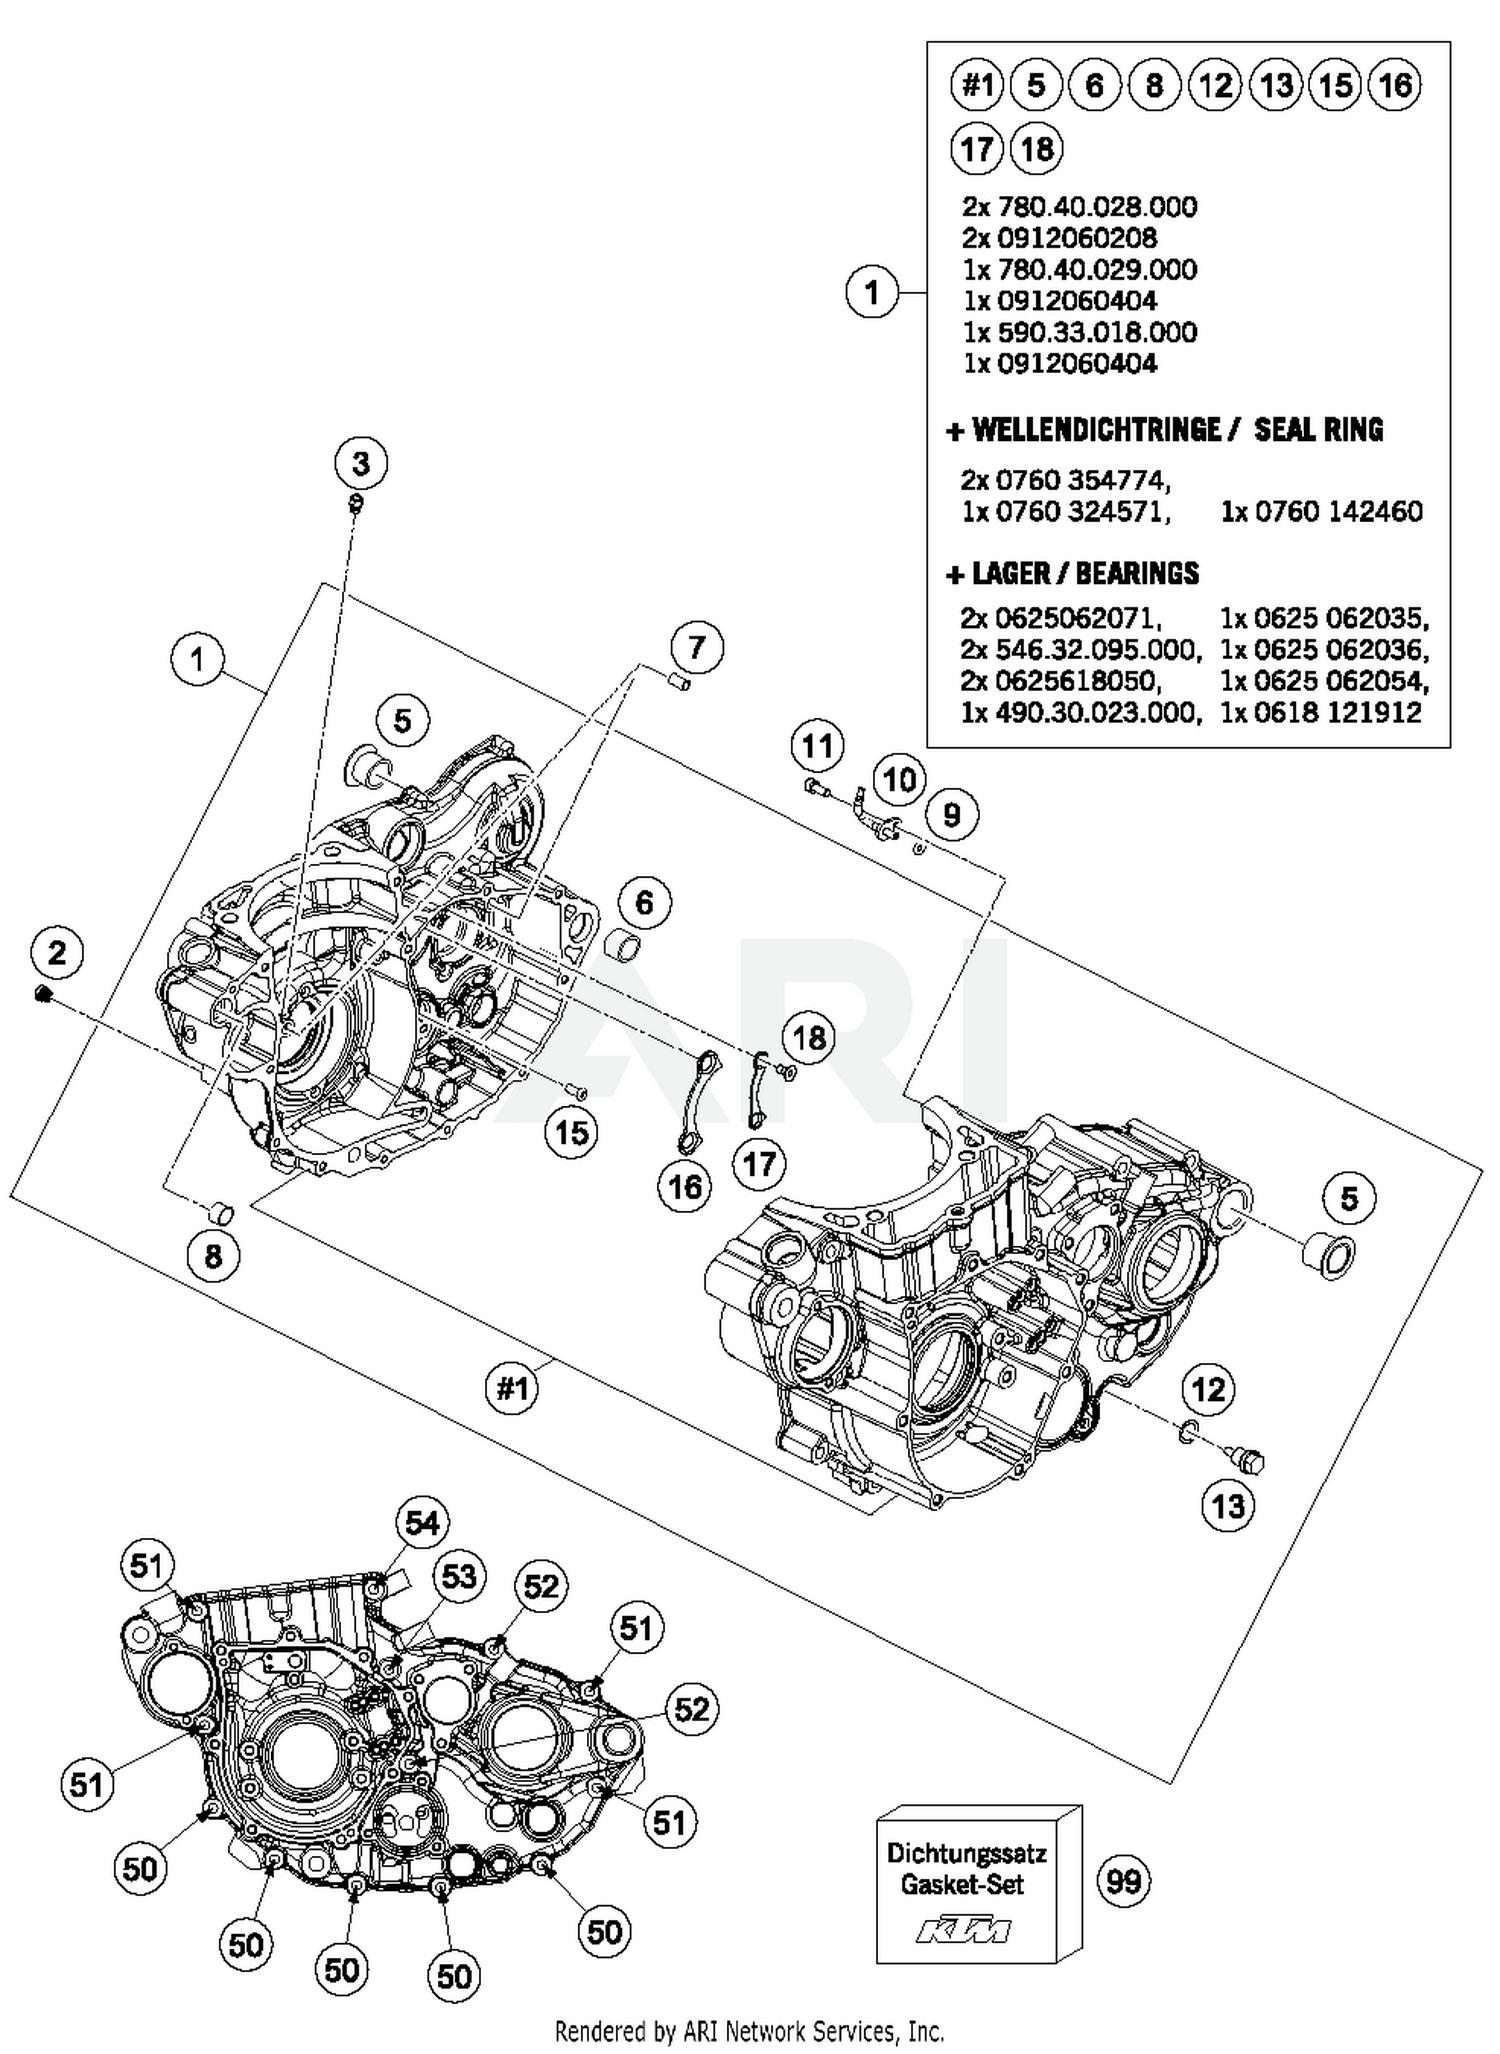 2016 ktm 500 xc w engine case parts w16 schematic search results 0